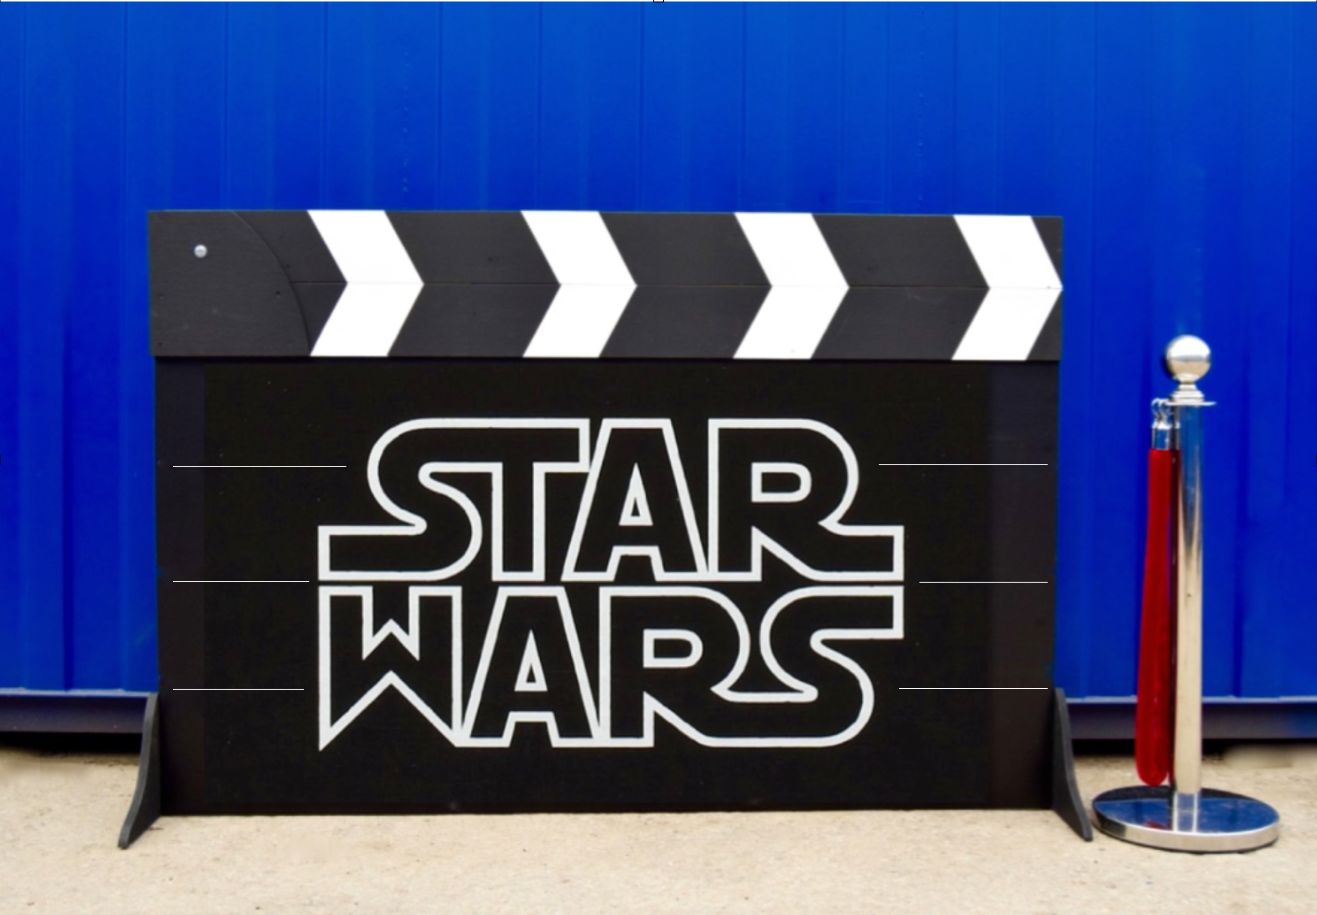 Sar Wars Clapper Board Prop